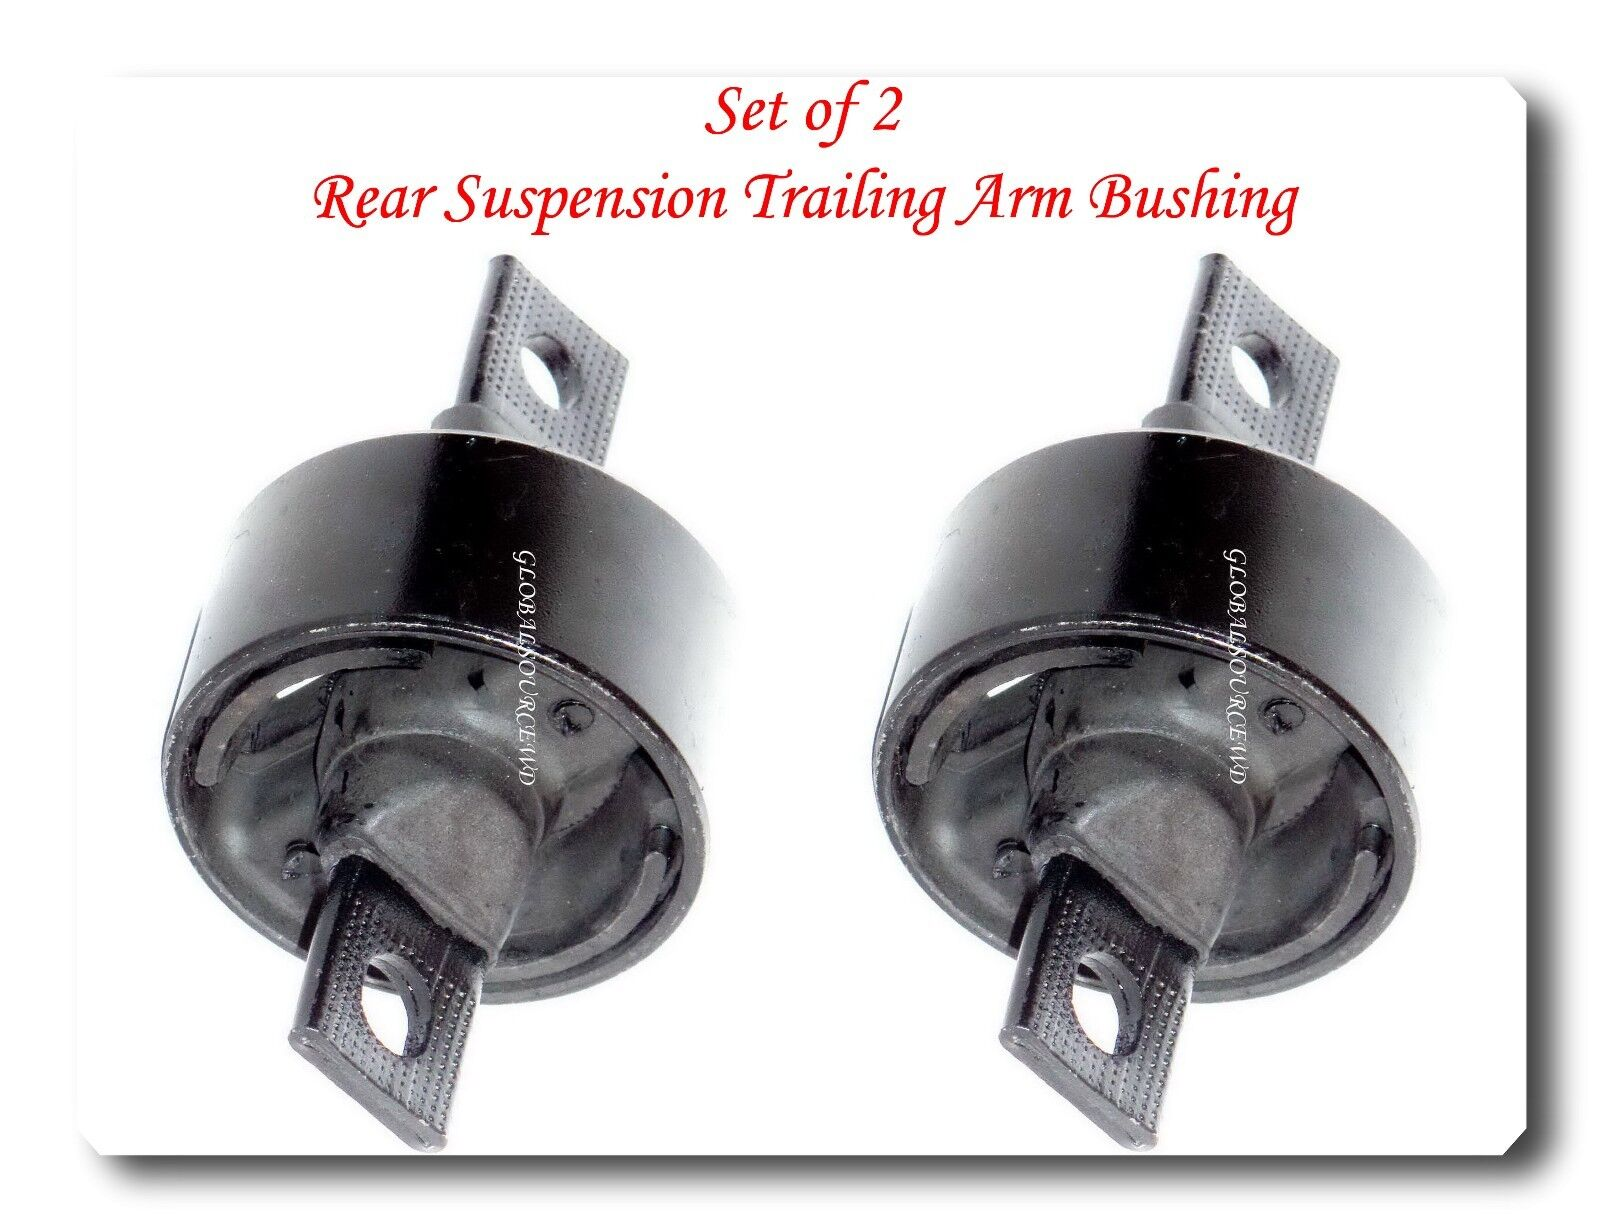 Set 2 Rear Suspension Trailing Arm Bushing Fits INTEGRA CIVIC DEL SOL CR-V CRX